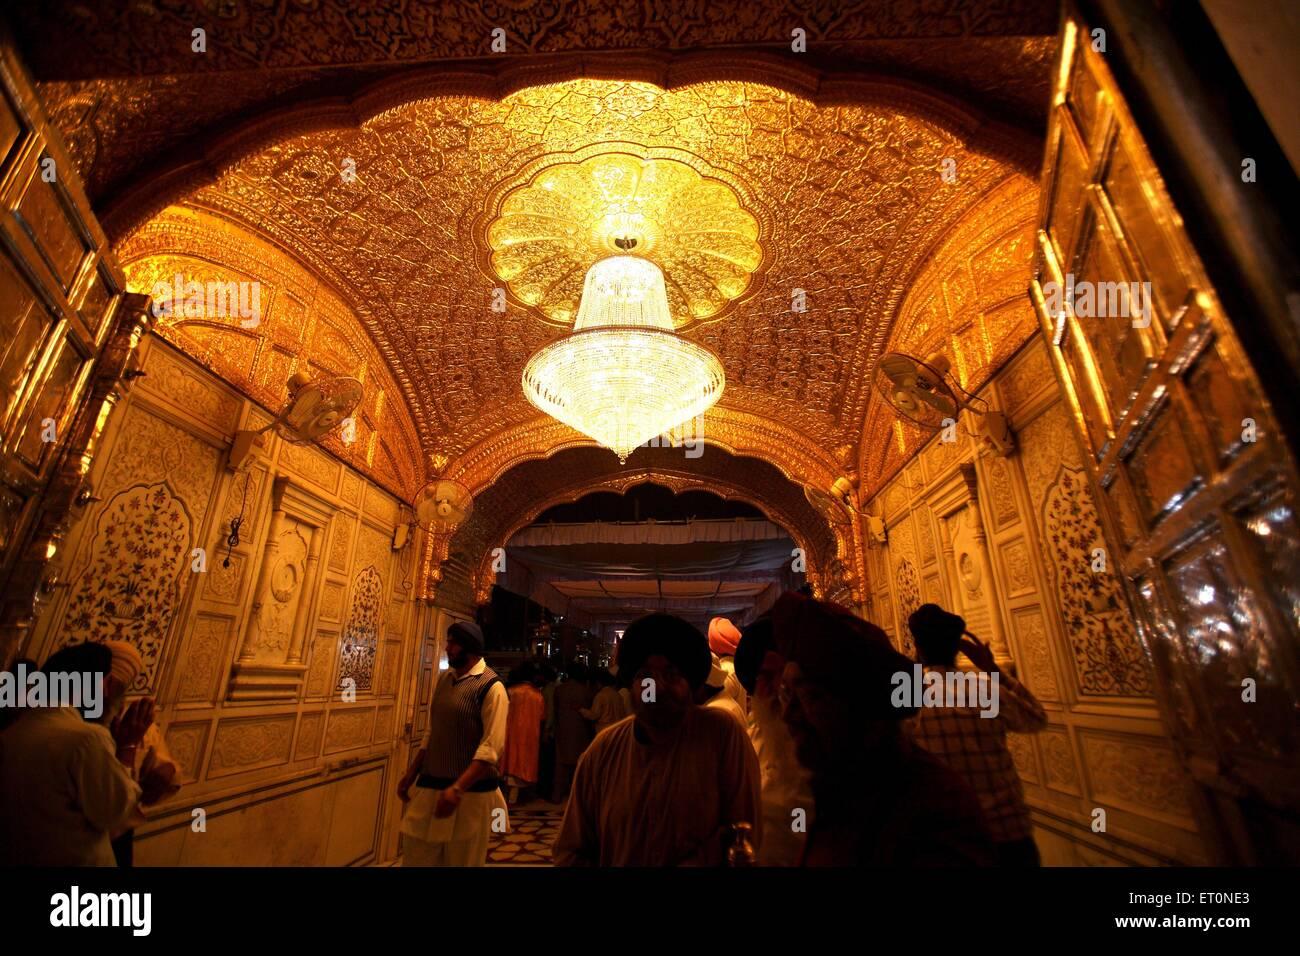 Kronleuchter Indien ~ Anhänger unter kronleuchter in harmandir sahib oder darbar sahib